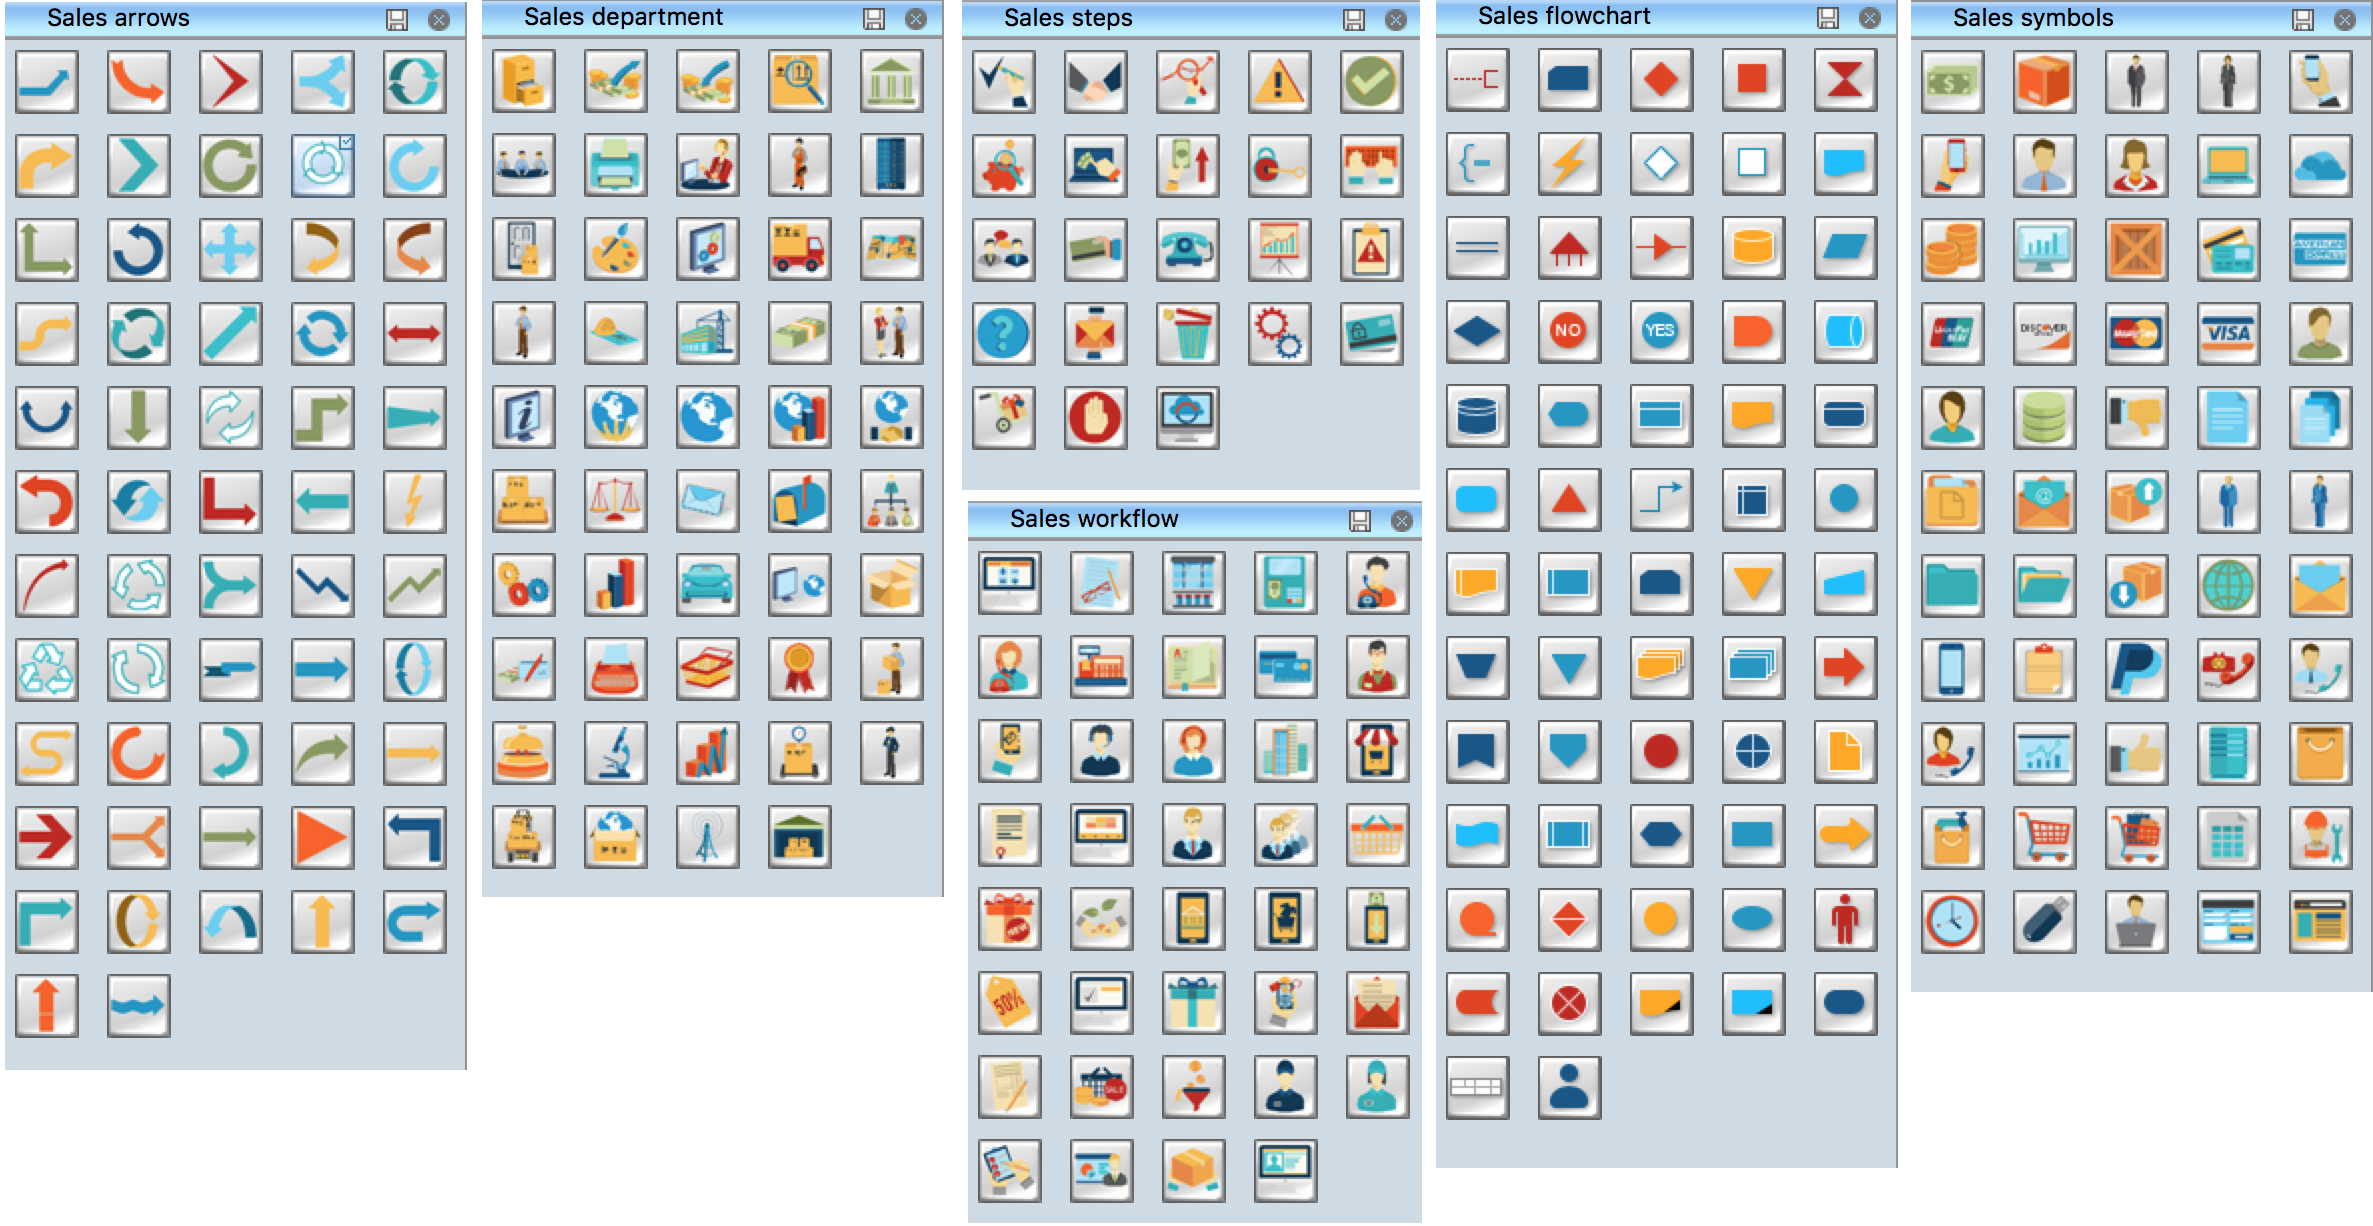 medium resolution of sales process flowchart symbols sales process flow diagram red green blue colored flowchart symbols